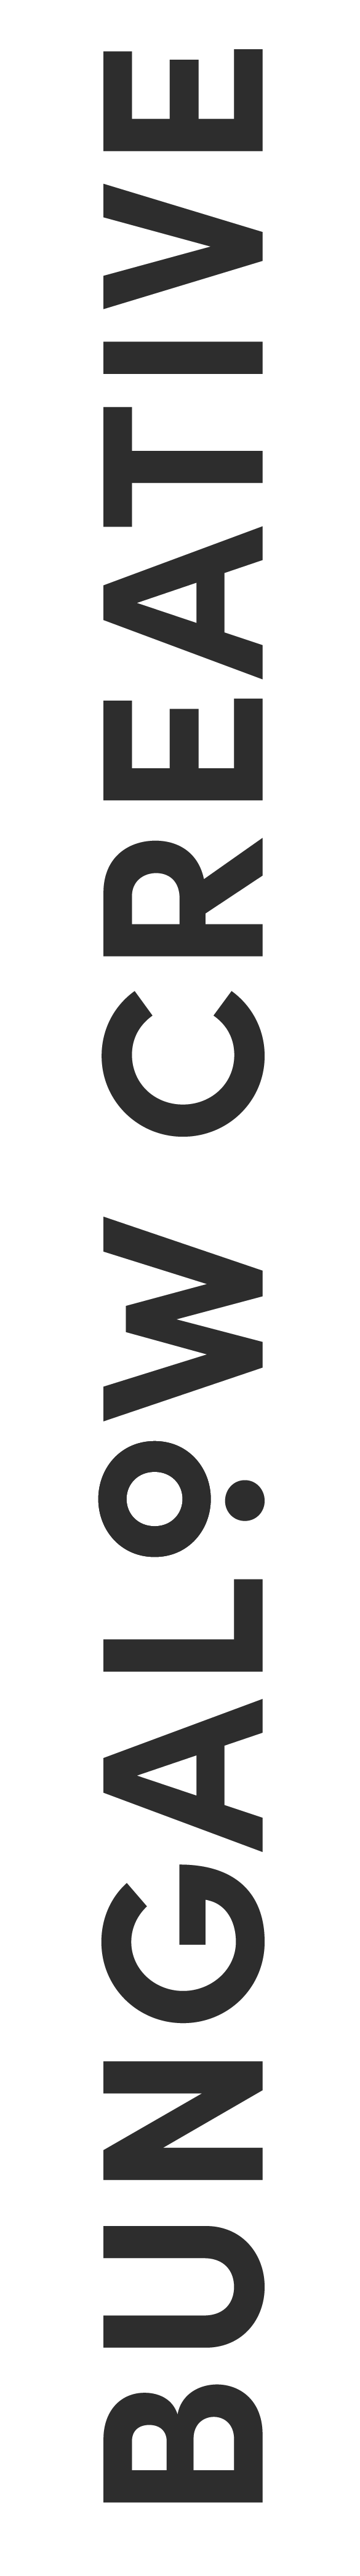 BungalowCreative_AltLogo-Vertical-01.png